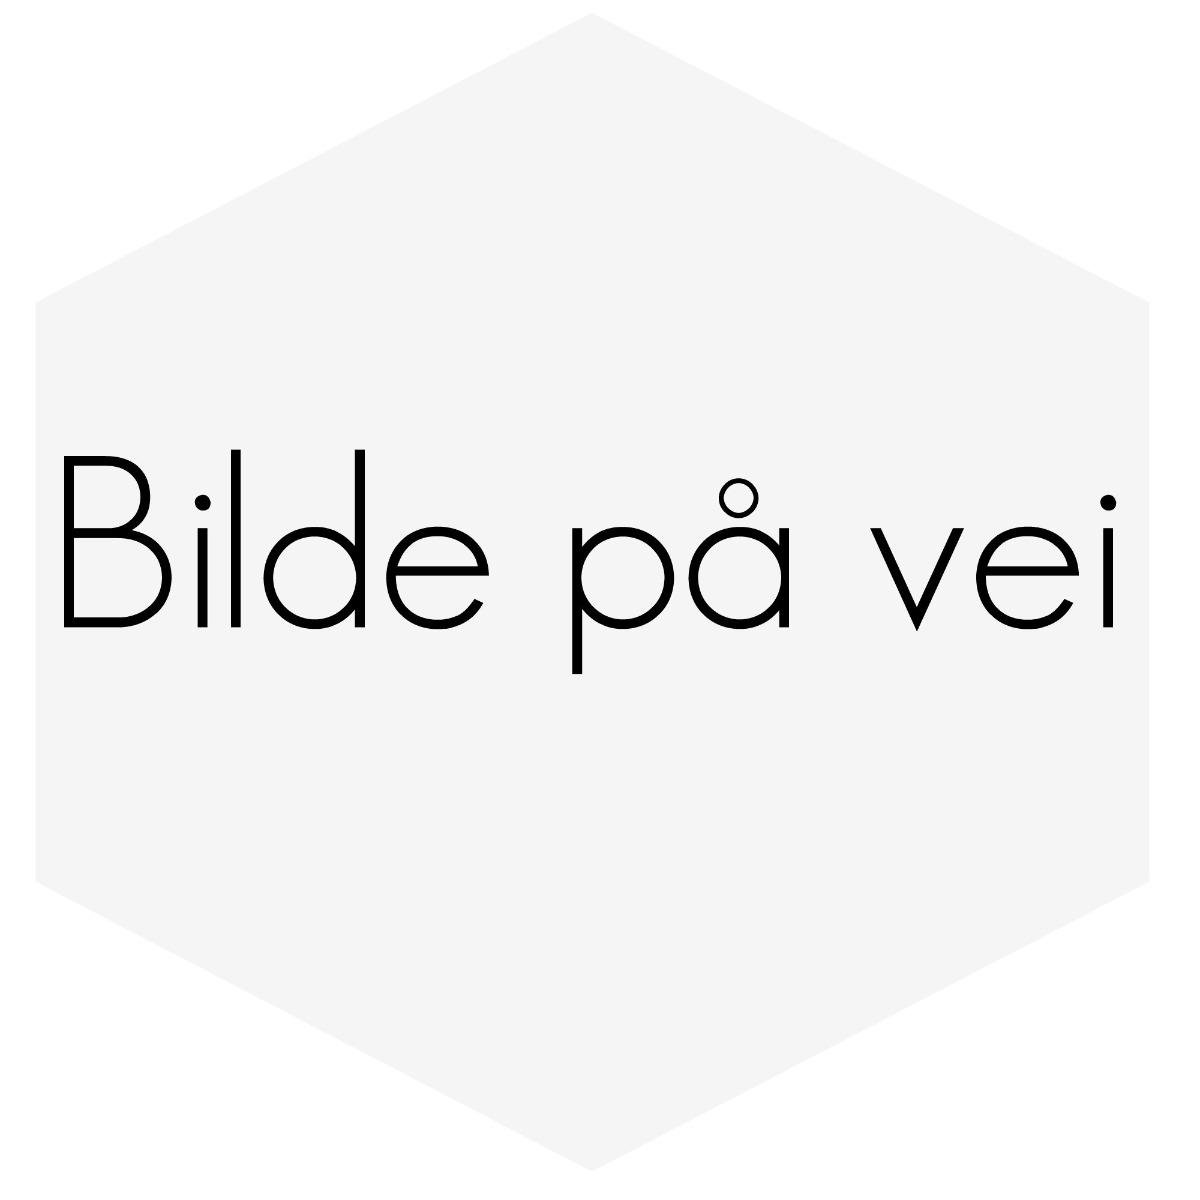 FILTER KUPE/FRISKLUFT VOLVO S80N,V70NN,XC60+70  se info